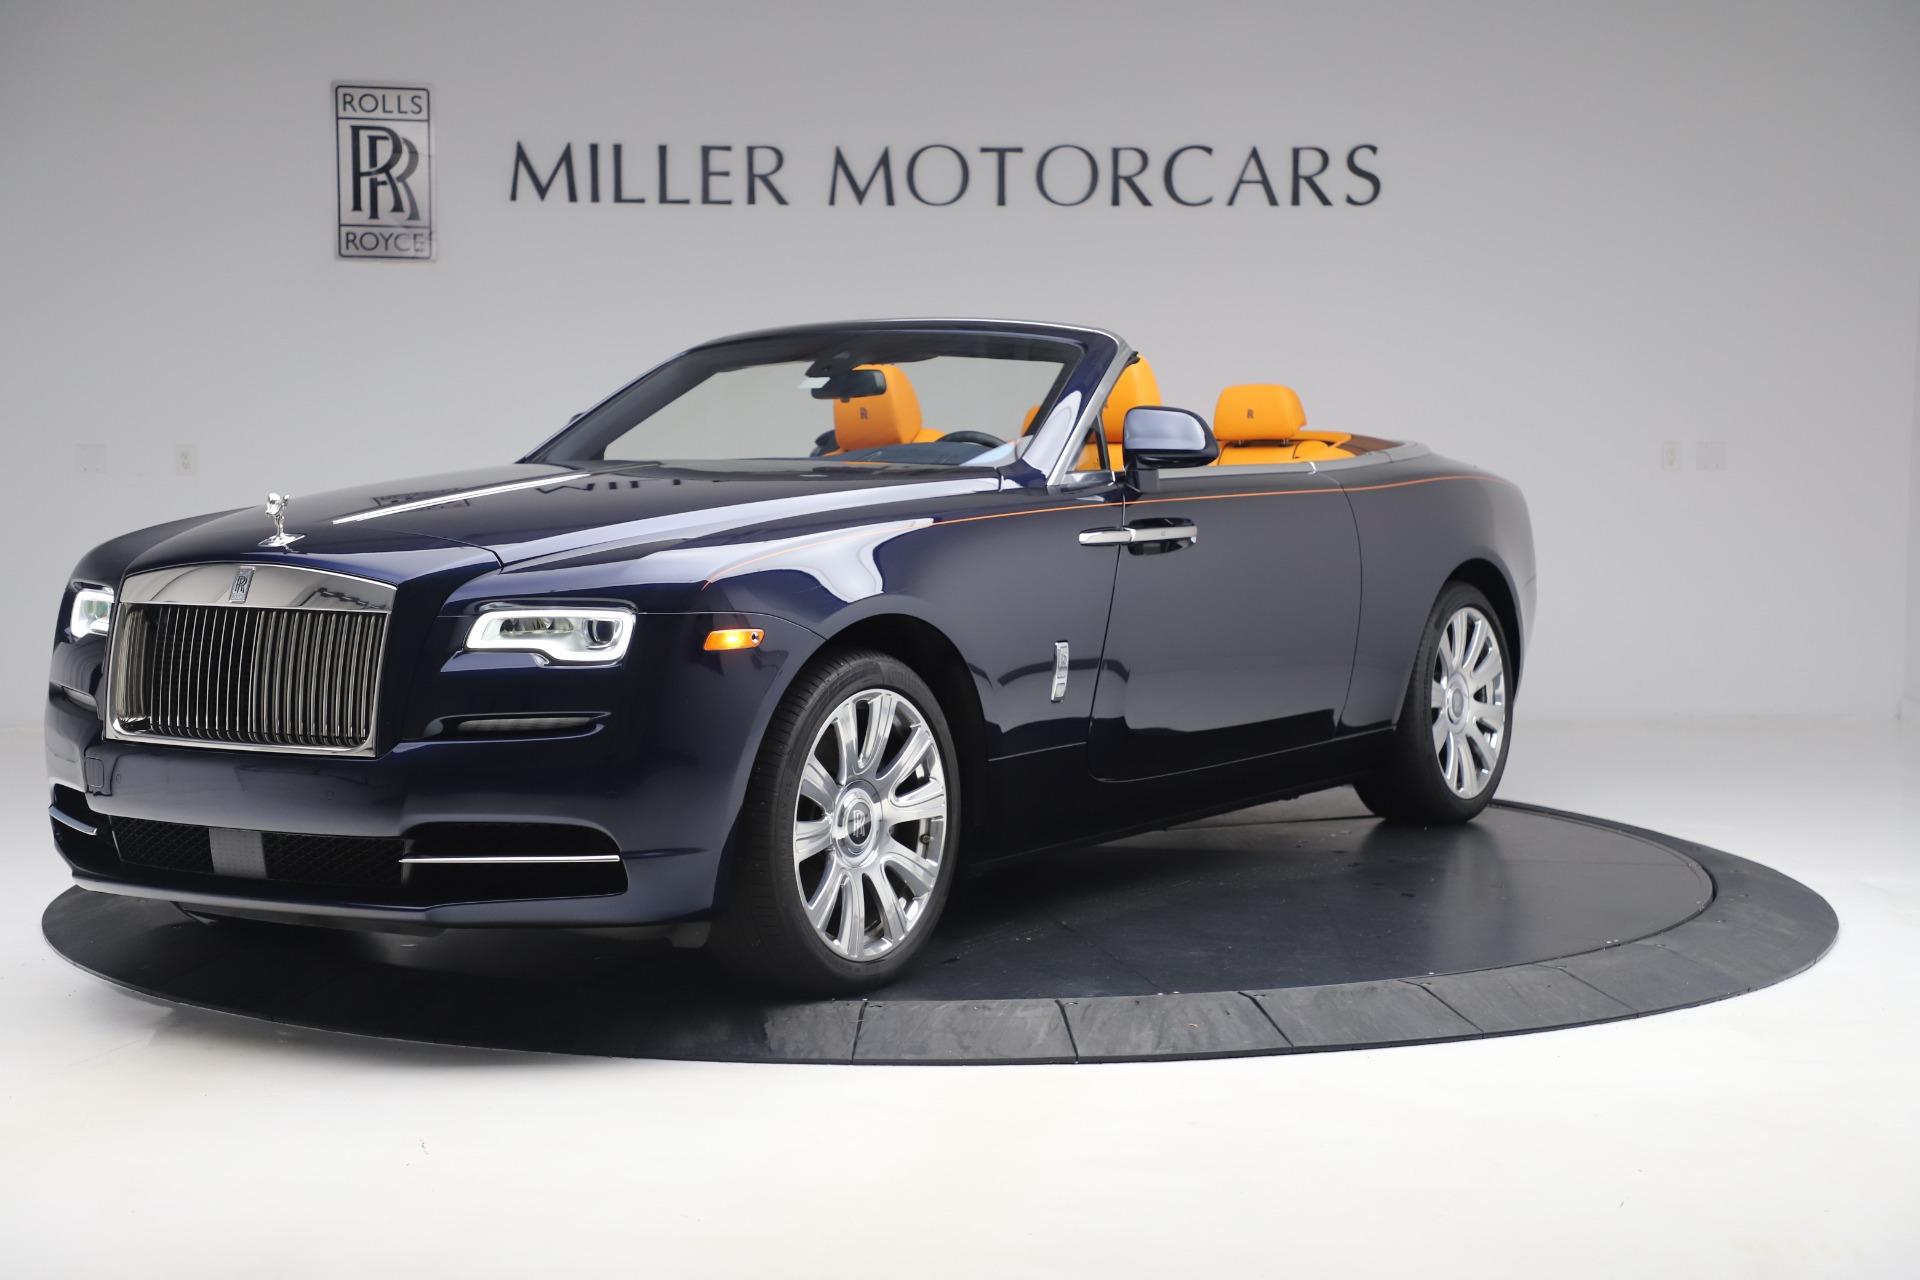 Used 2017 Rolls-Royce Dawn for sale $249,900 at Bugatti of Greenwich in Greenwich CT 06830 1